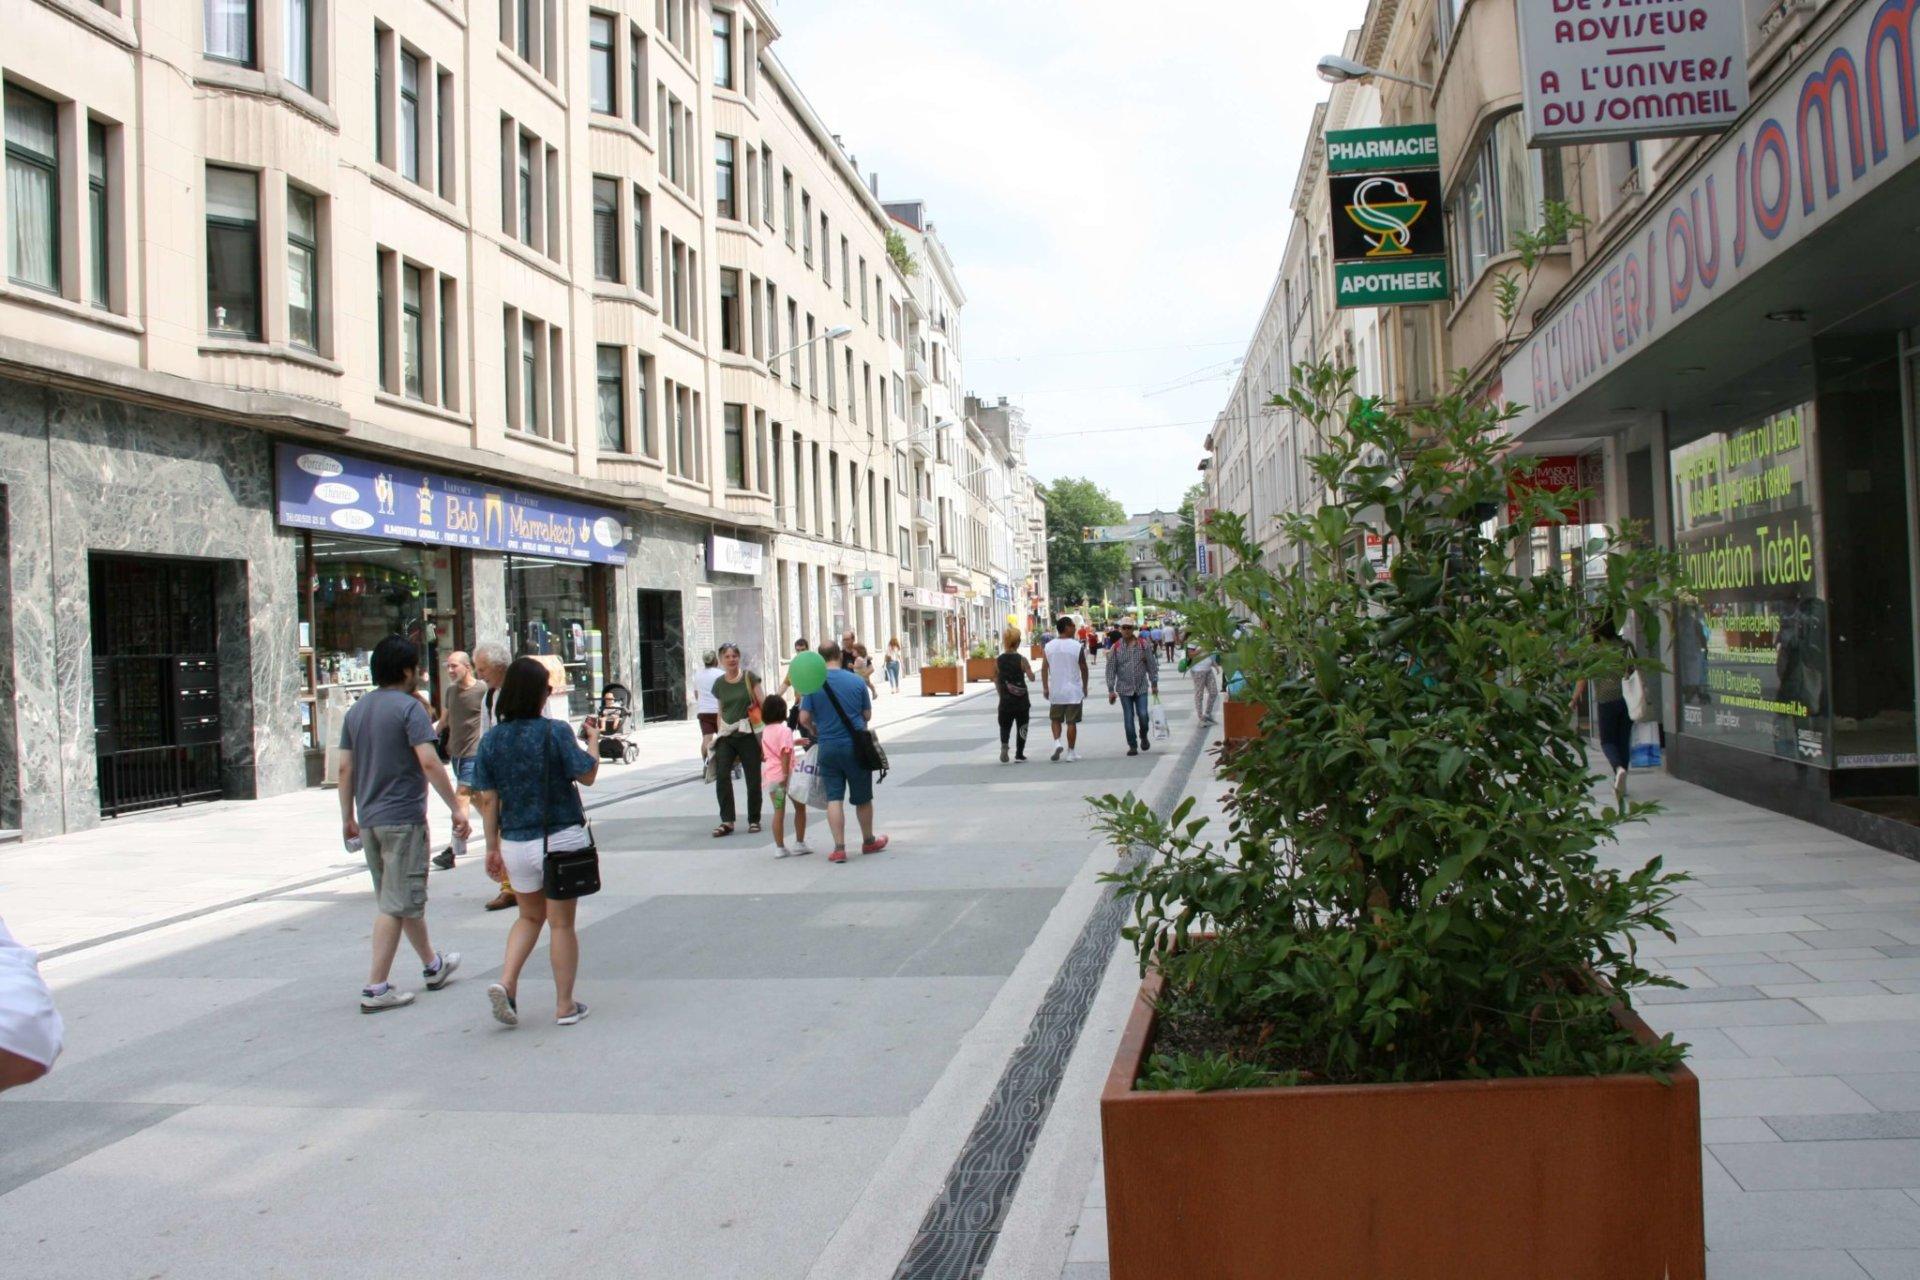 Chaussée d'Ixelles 41